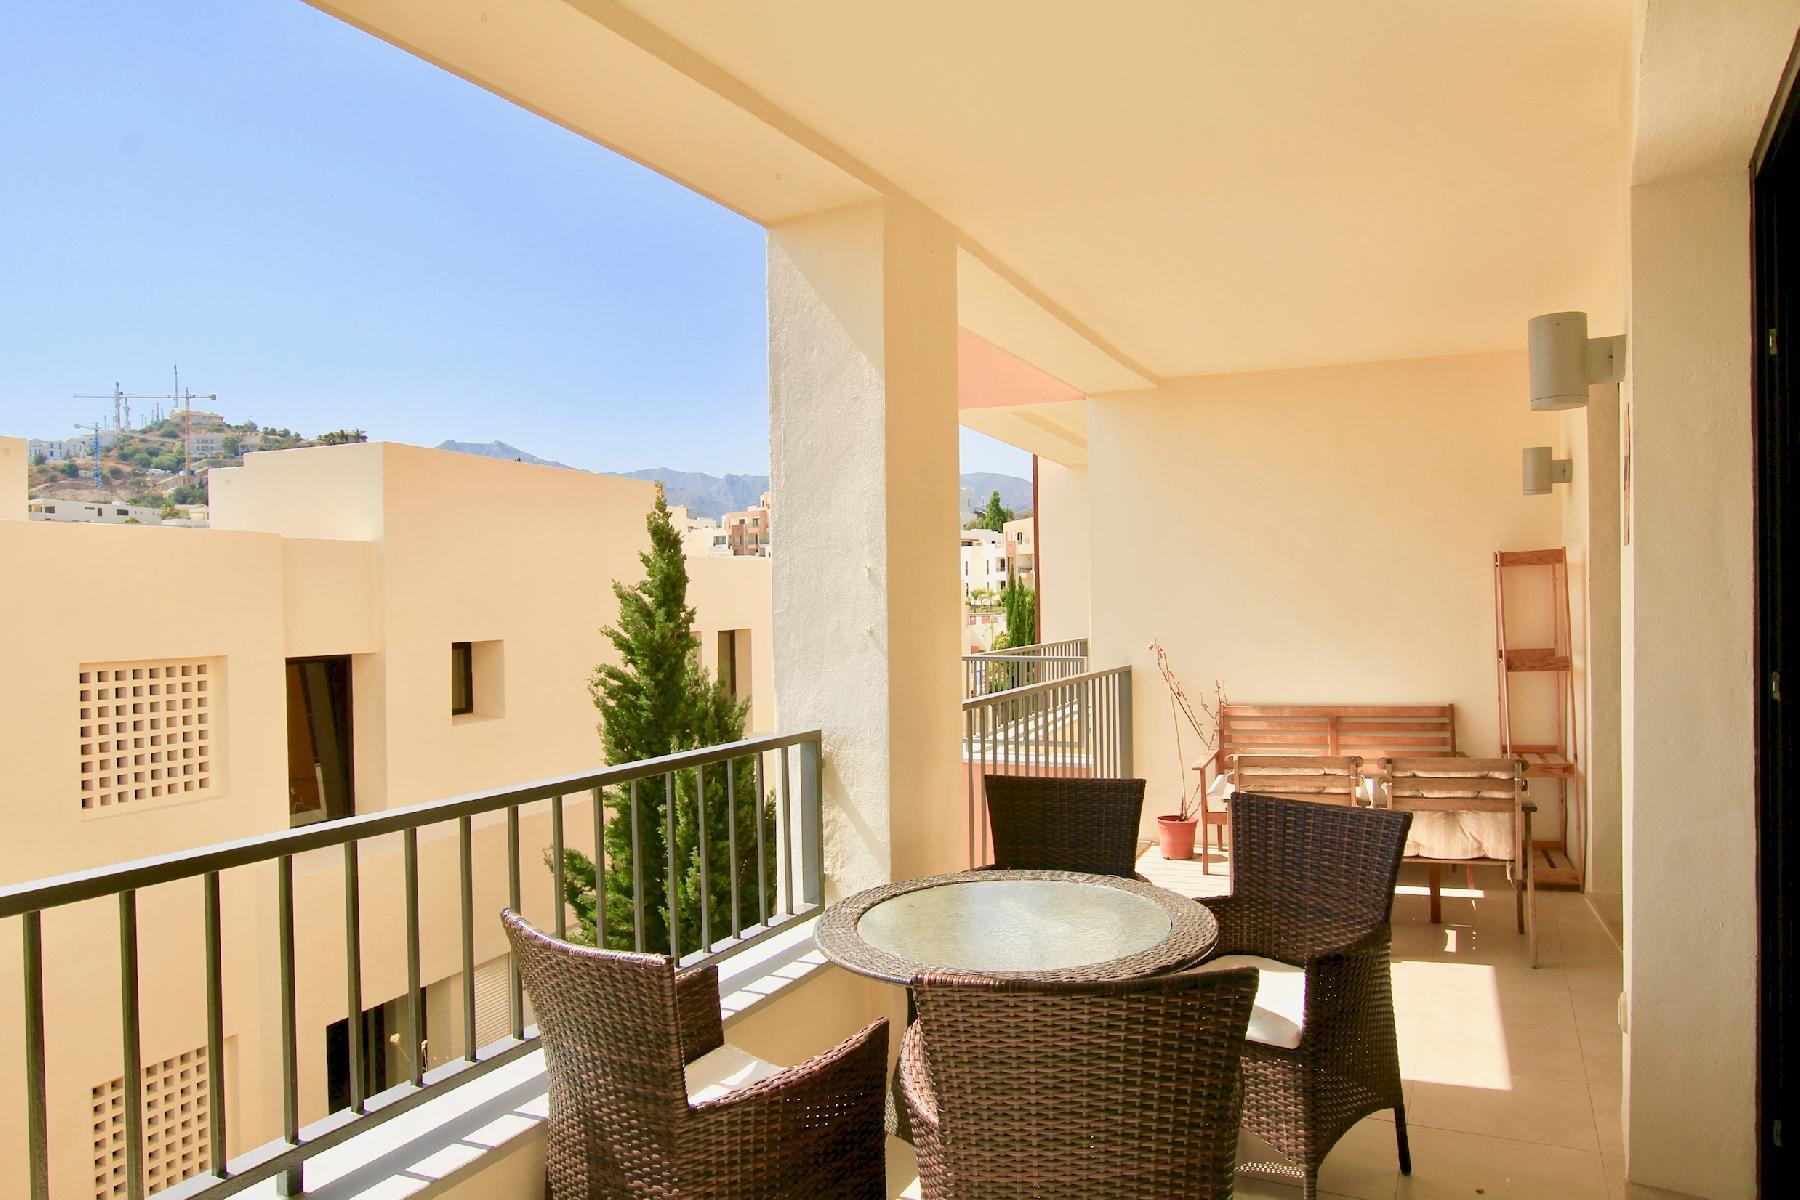 Samara 3 - Modern 2BR in Samara Resort Marbella, Indoor and Outdoor Pools, SPA